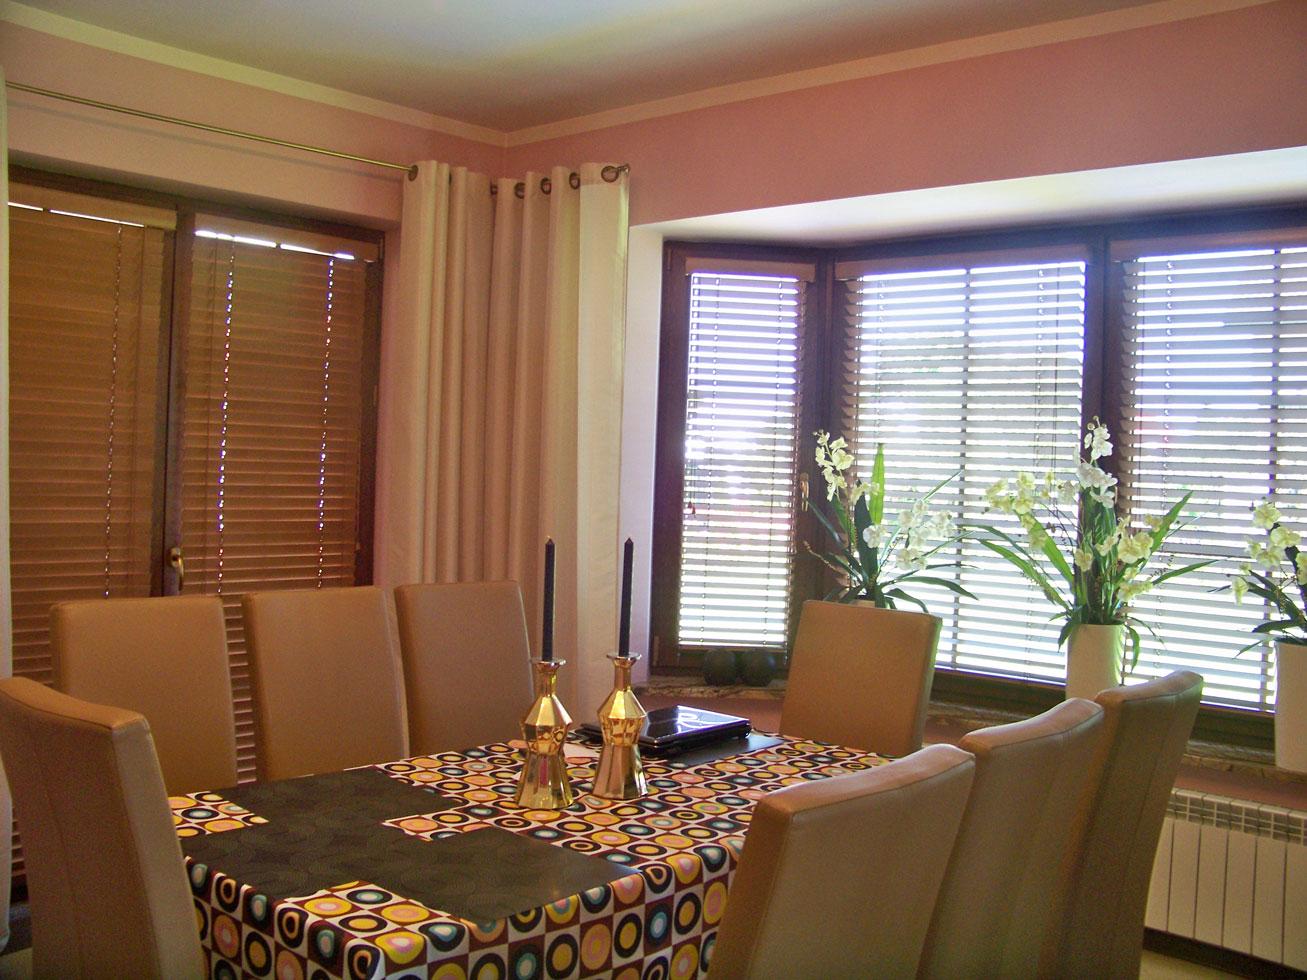 holz jalousien 50mm nach ma online shop rollos holzjalousien bestellen. Black Bedroom Furniture Sets. Home Design Ideas